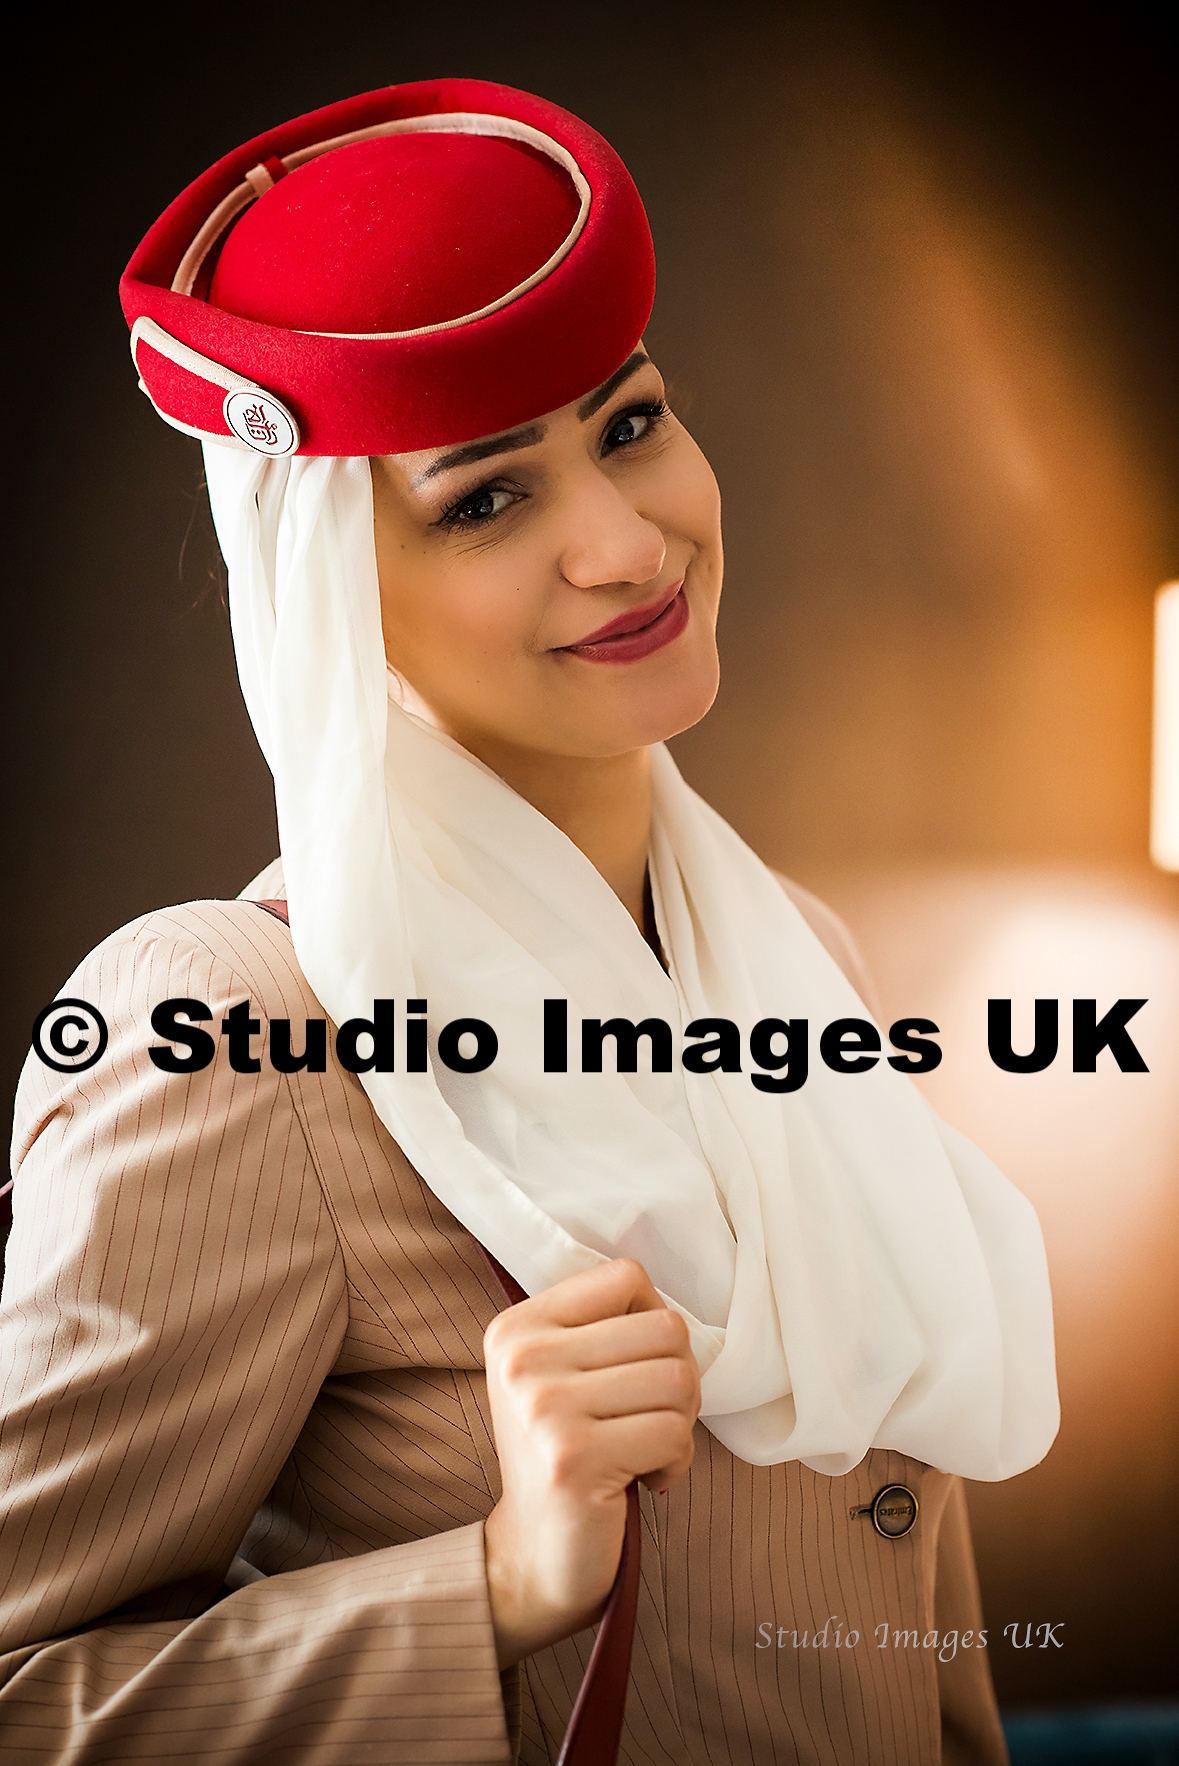 Emirates cabin crew photo requirement